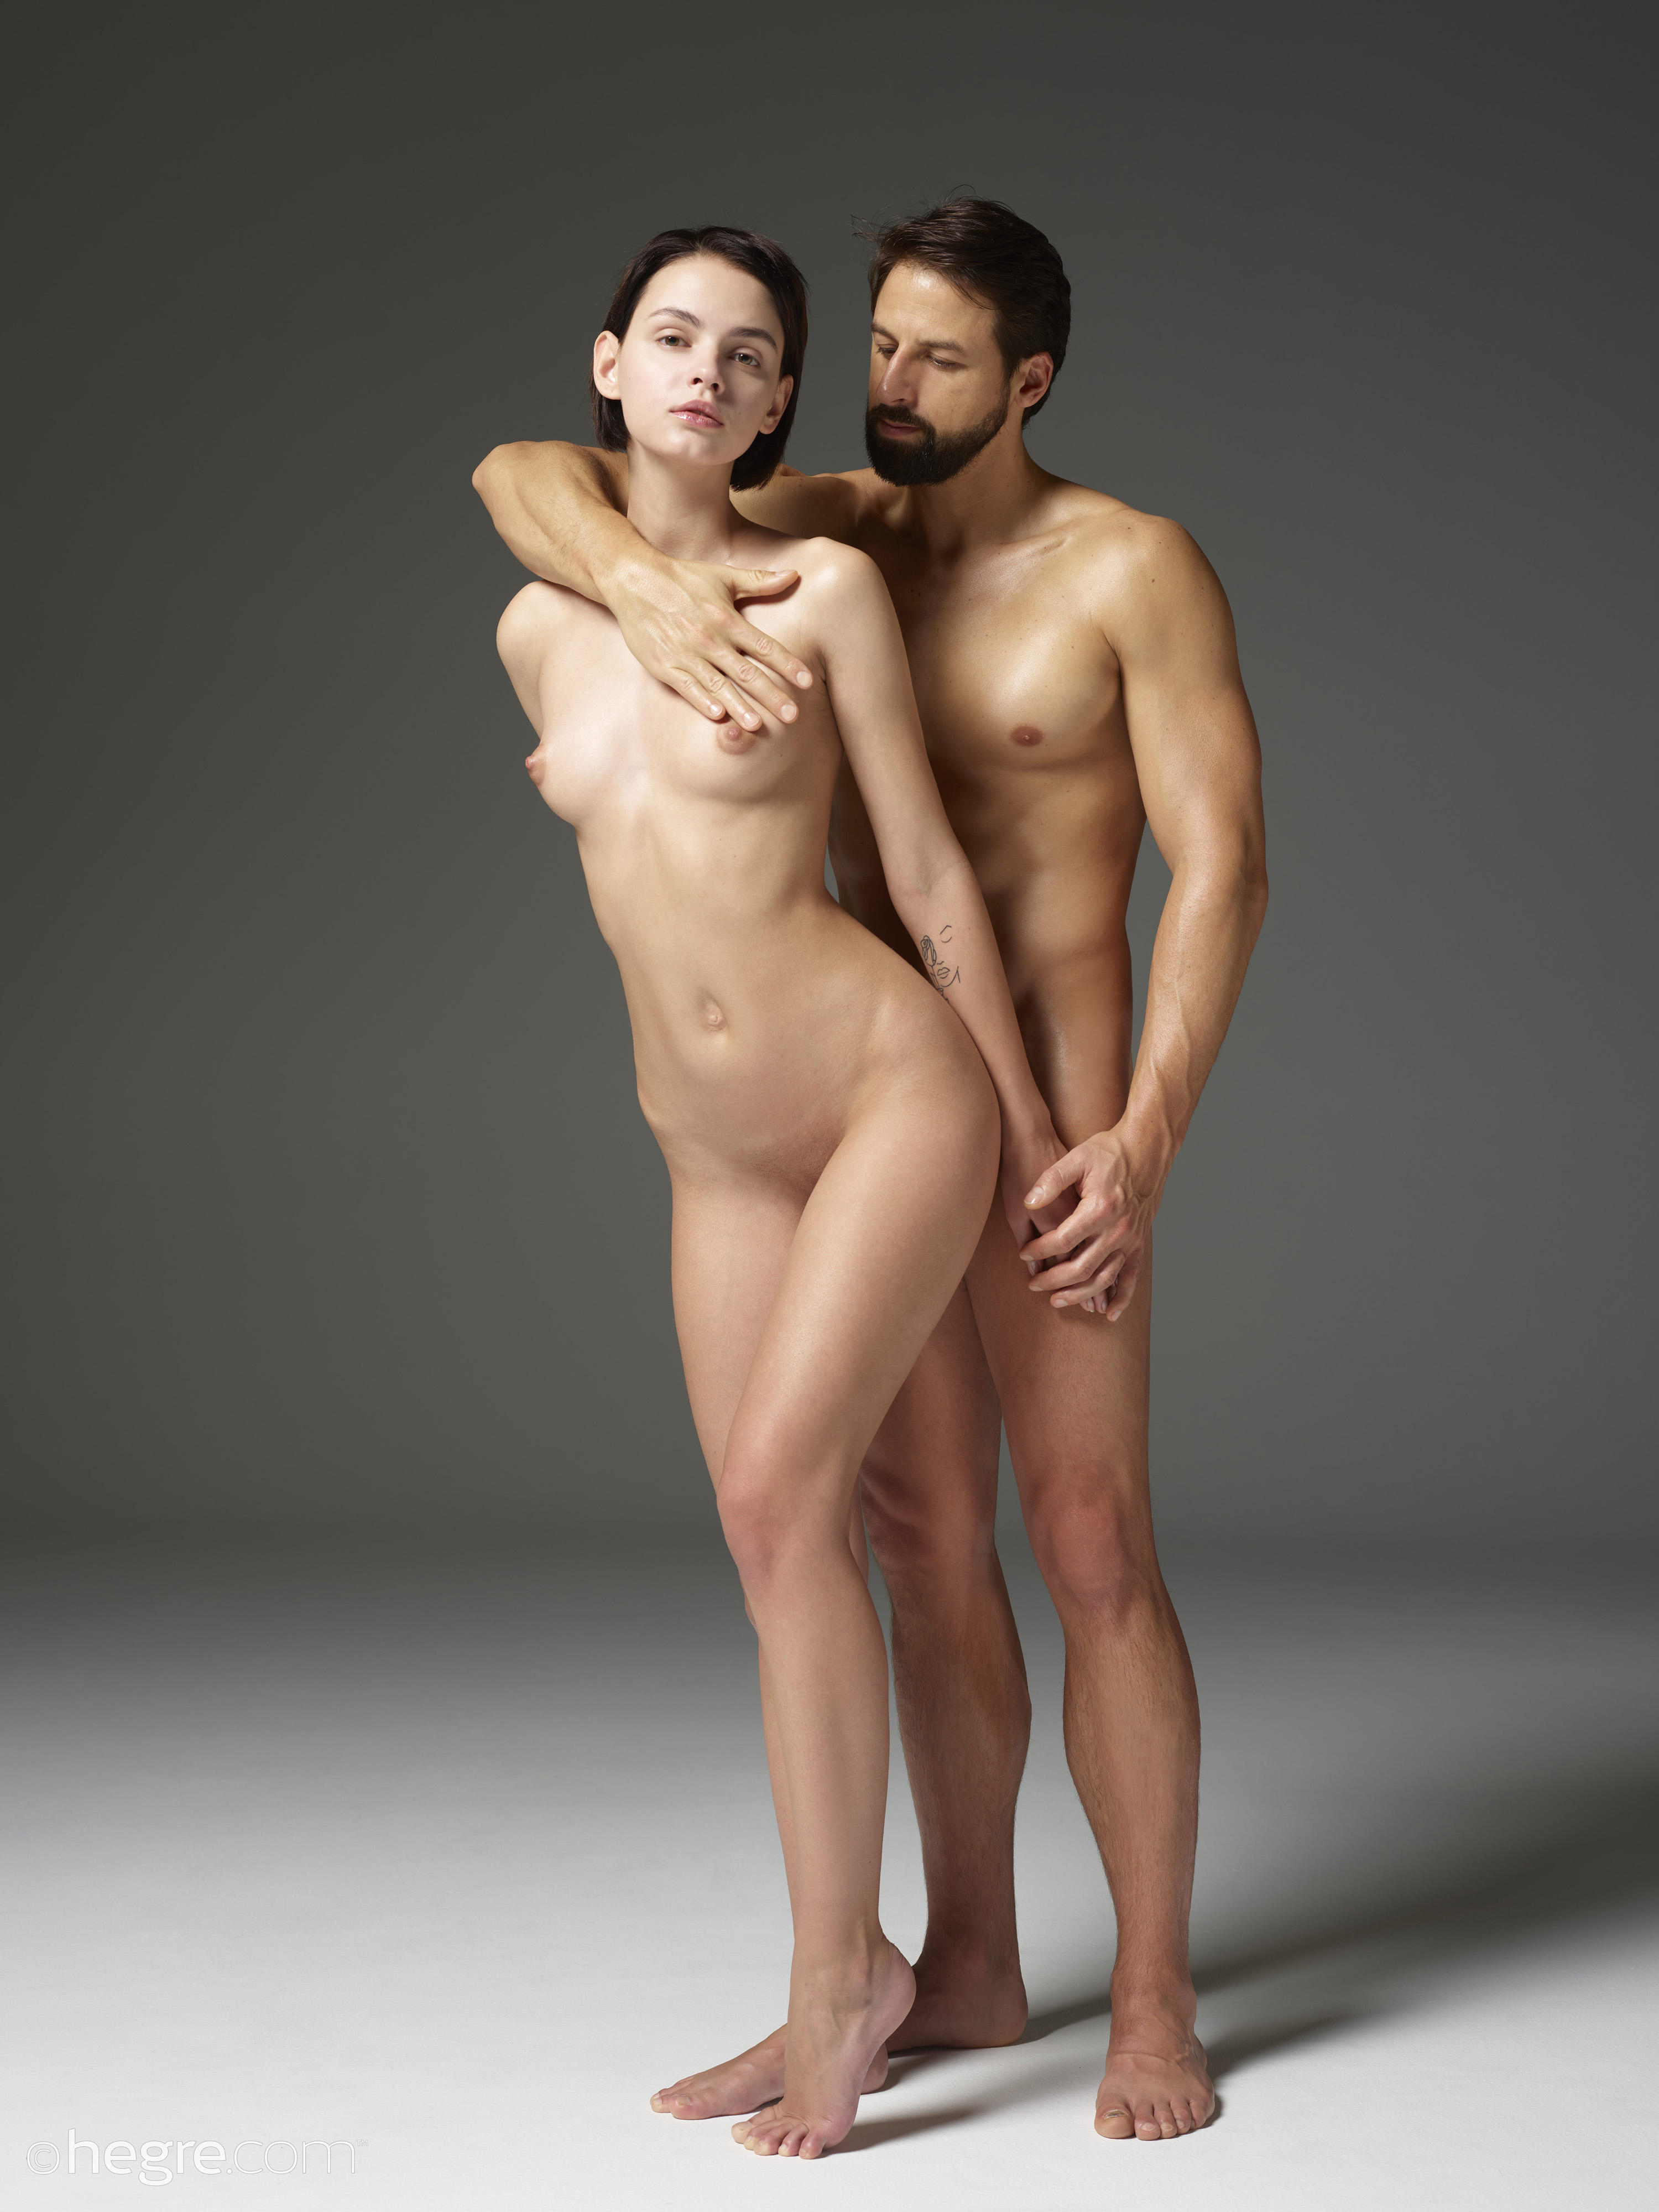 Amateur nude photo shoot